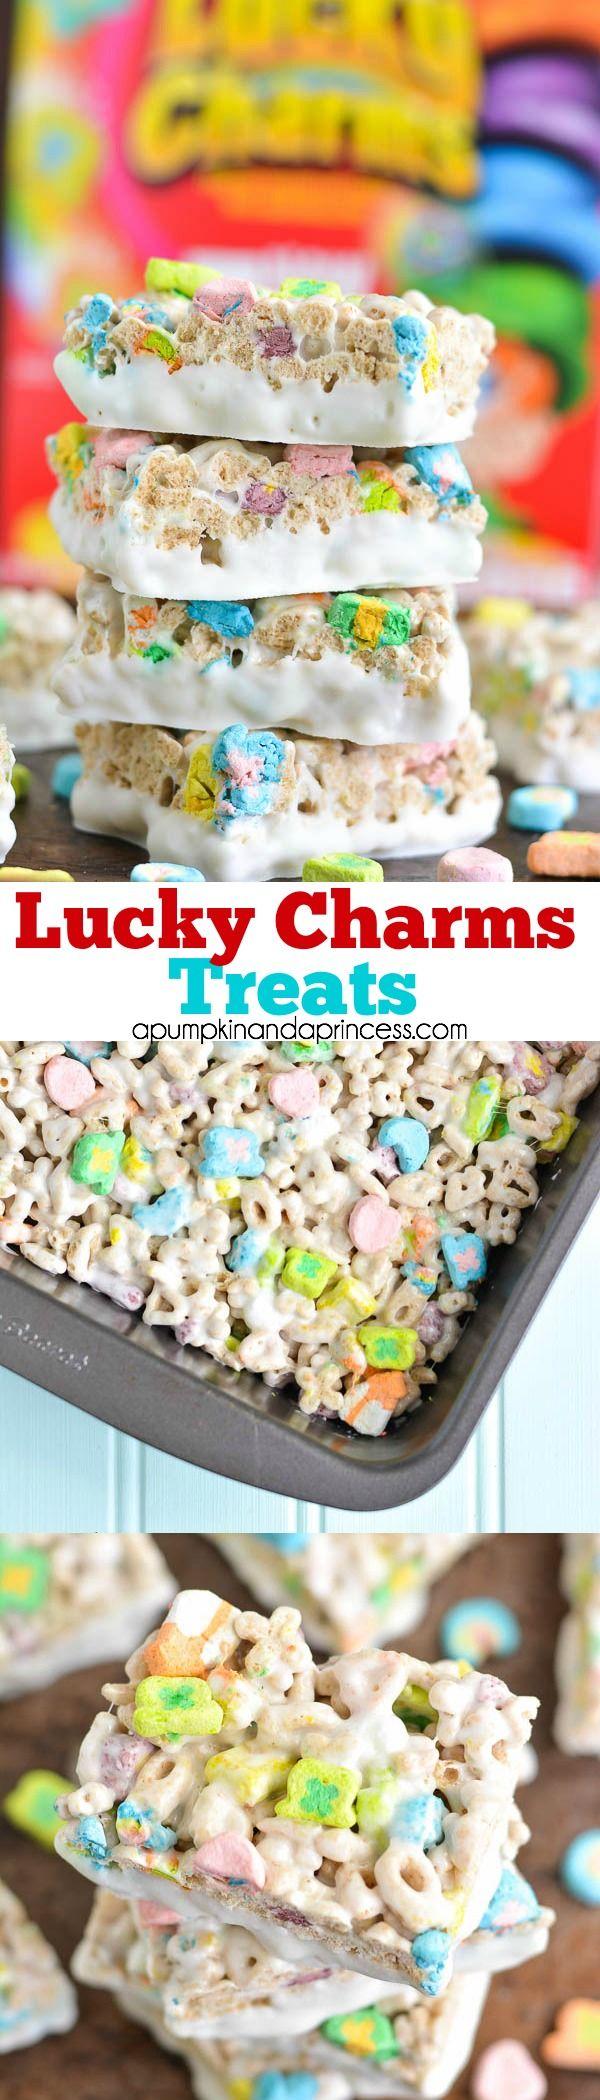 Lucky Charms Treats